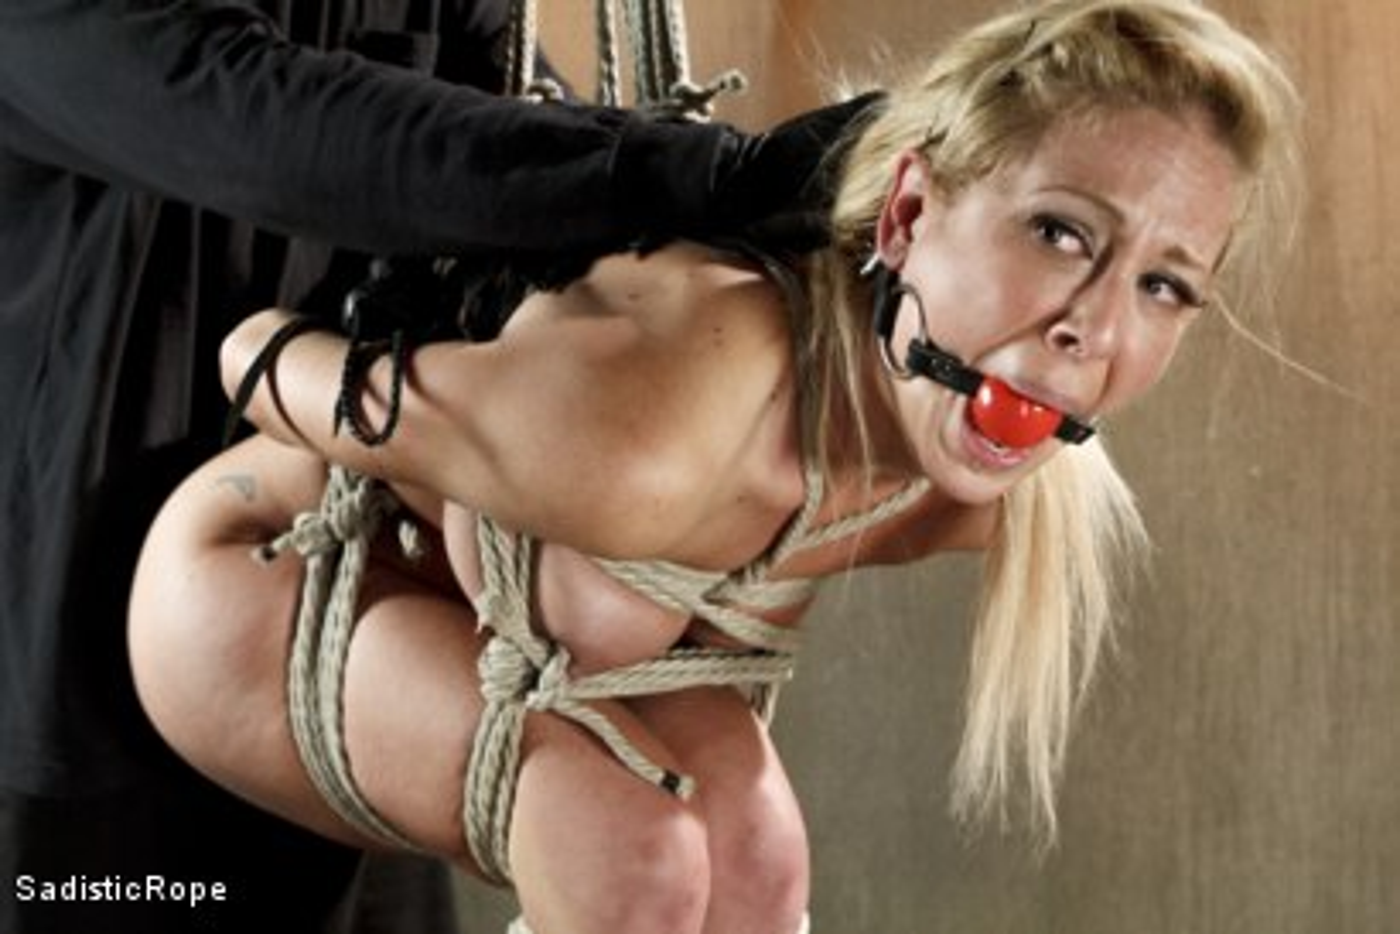 Photo number 7 from Hot Blonde with Big Tits in Brutal Predicament Bondage shot for Sadistic Rope on Kink.com. Featuring Cherie DeVille in hardcore BDSM & Fetish porn.